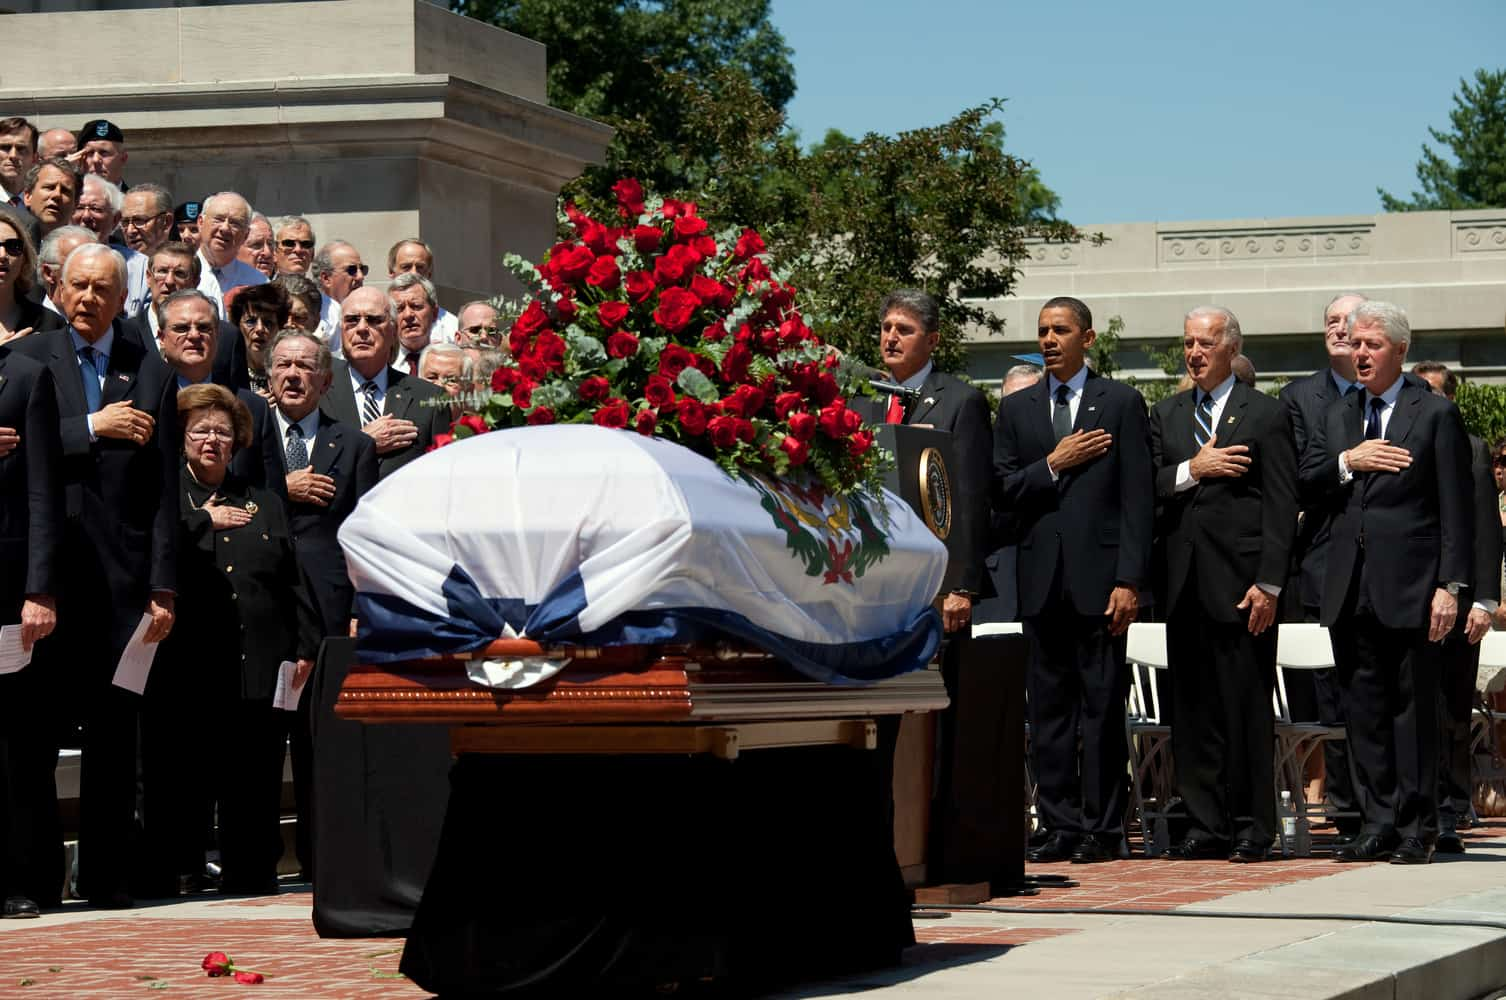 Memorial Cremations Funeral